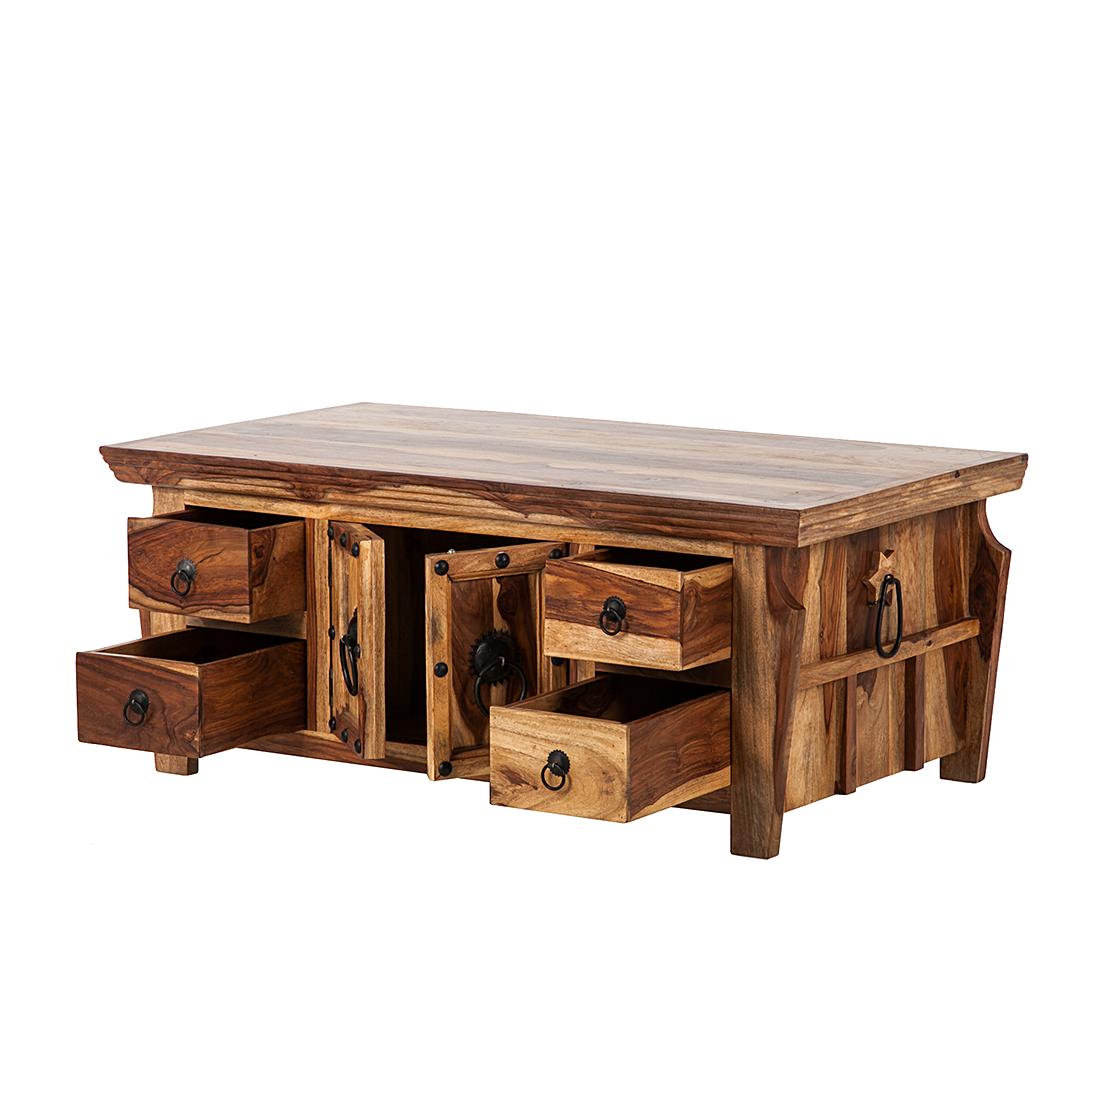 Truhentisch Honigfarben ~ Truhentisch Sheesham massiv Beistelltisch Schatztruhe Holztruhe Holz